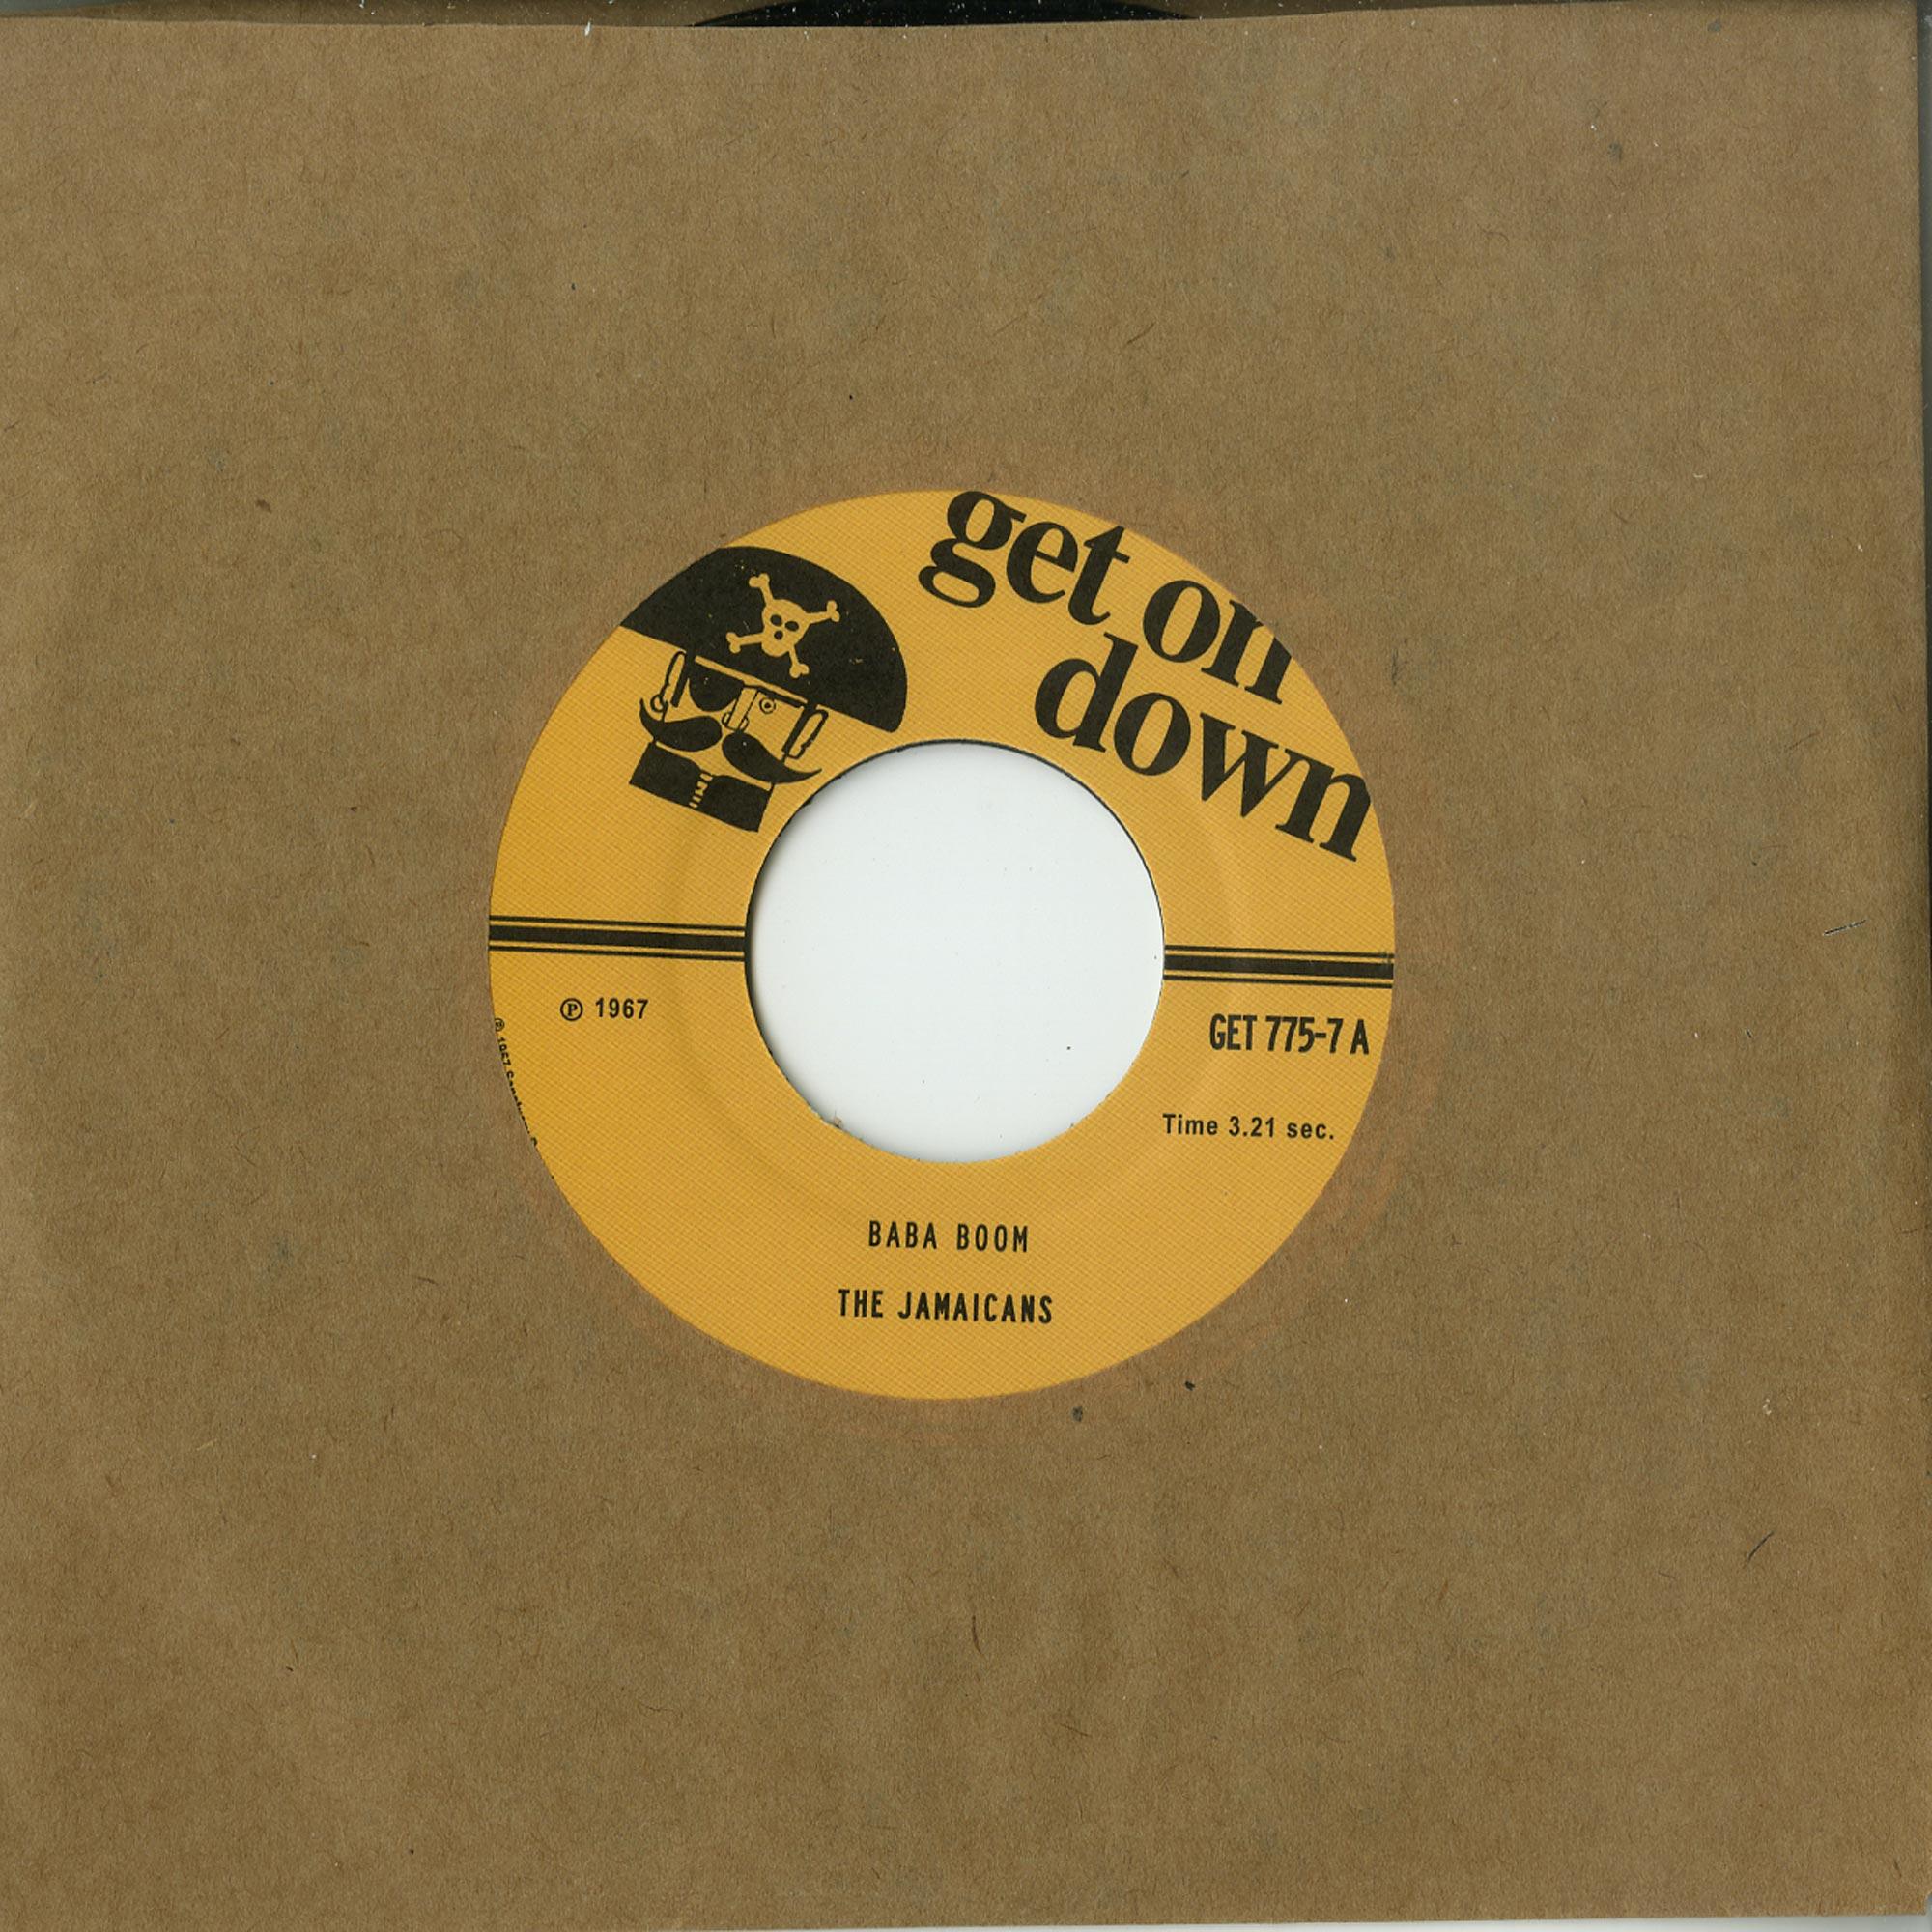 The Jamaicans - BA BA BOOM / TWILIGHT ZONE